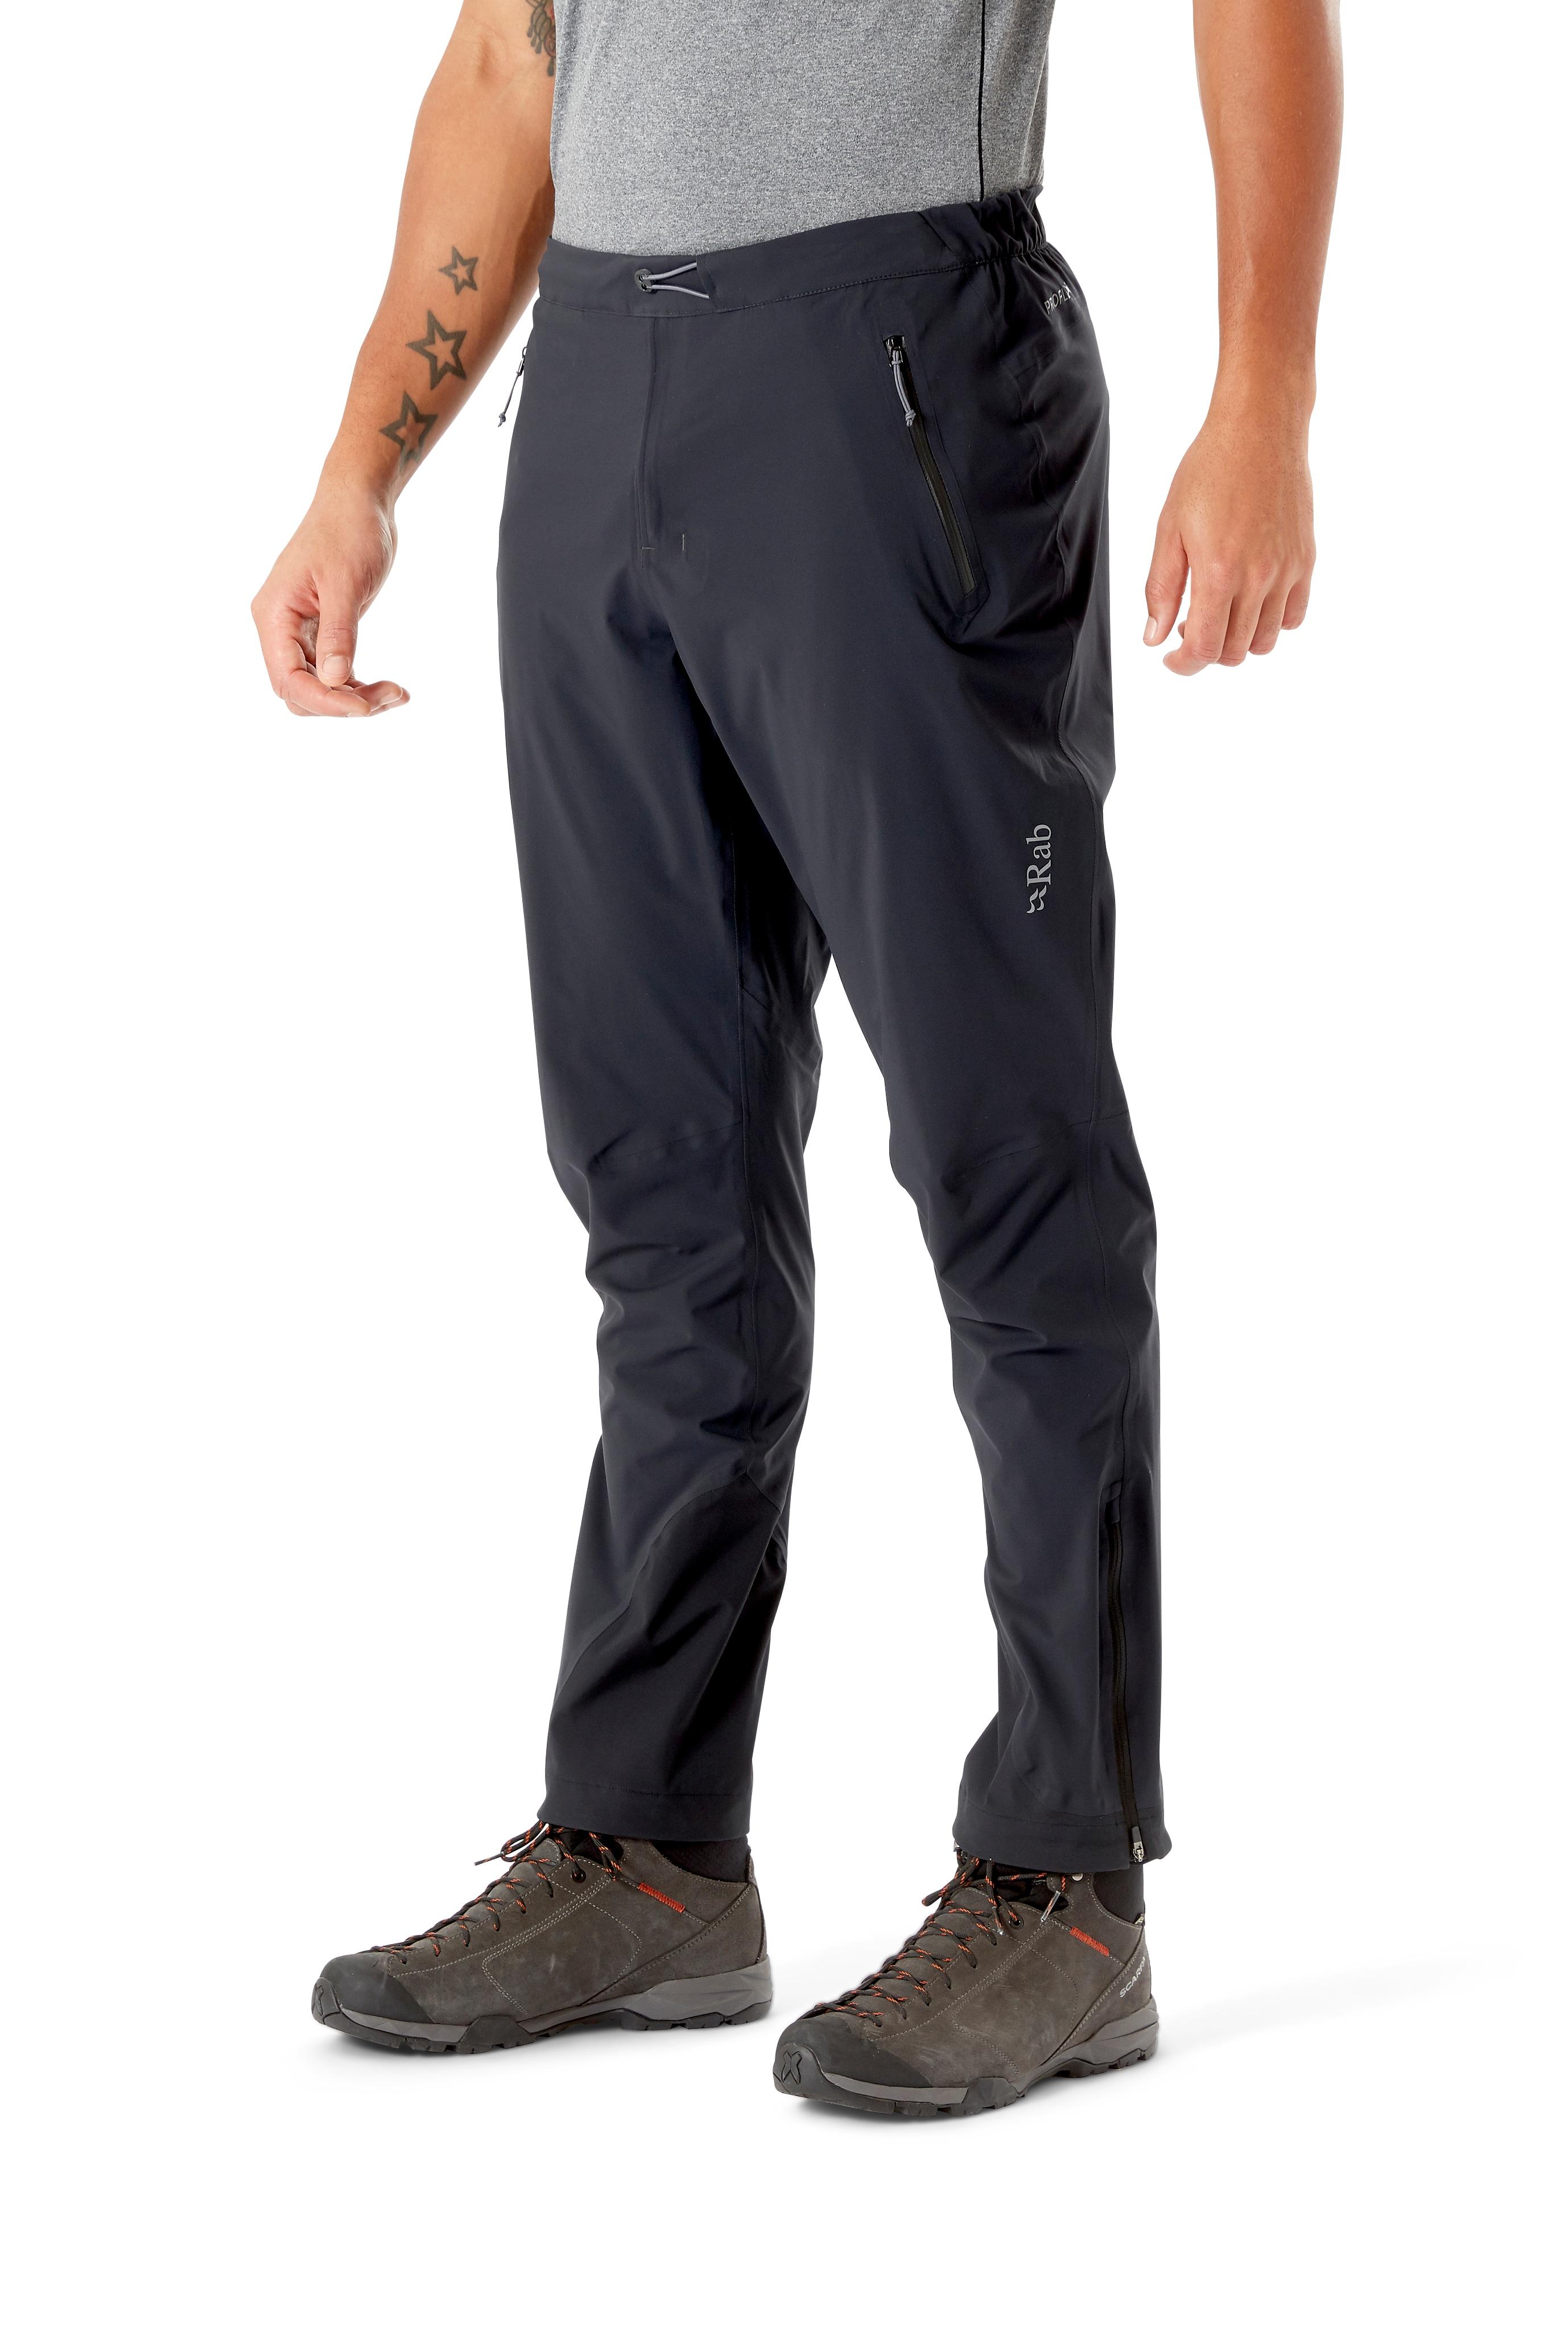 RAB Kinetic 2.0 Pants M's